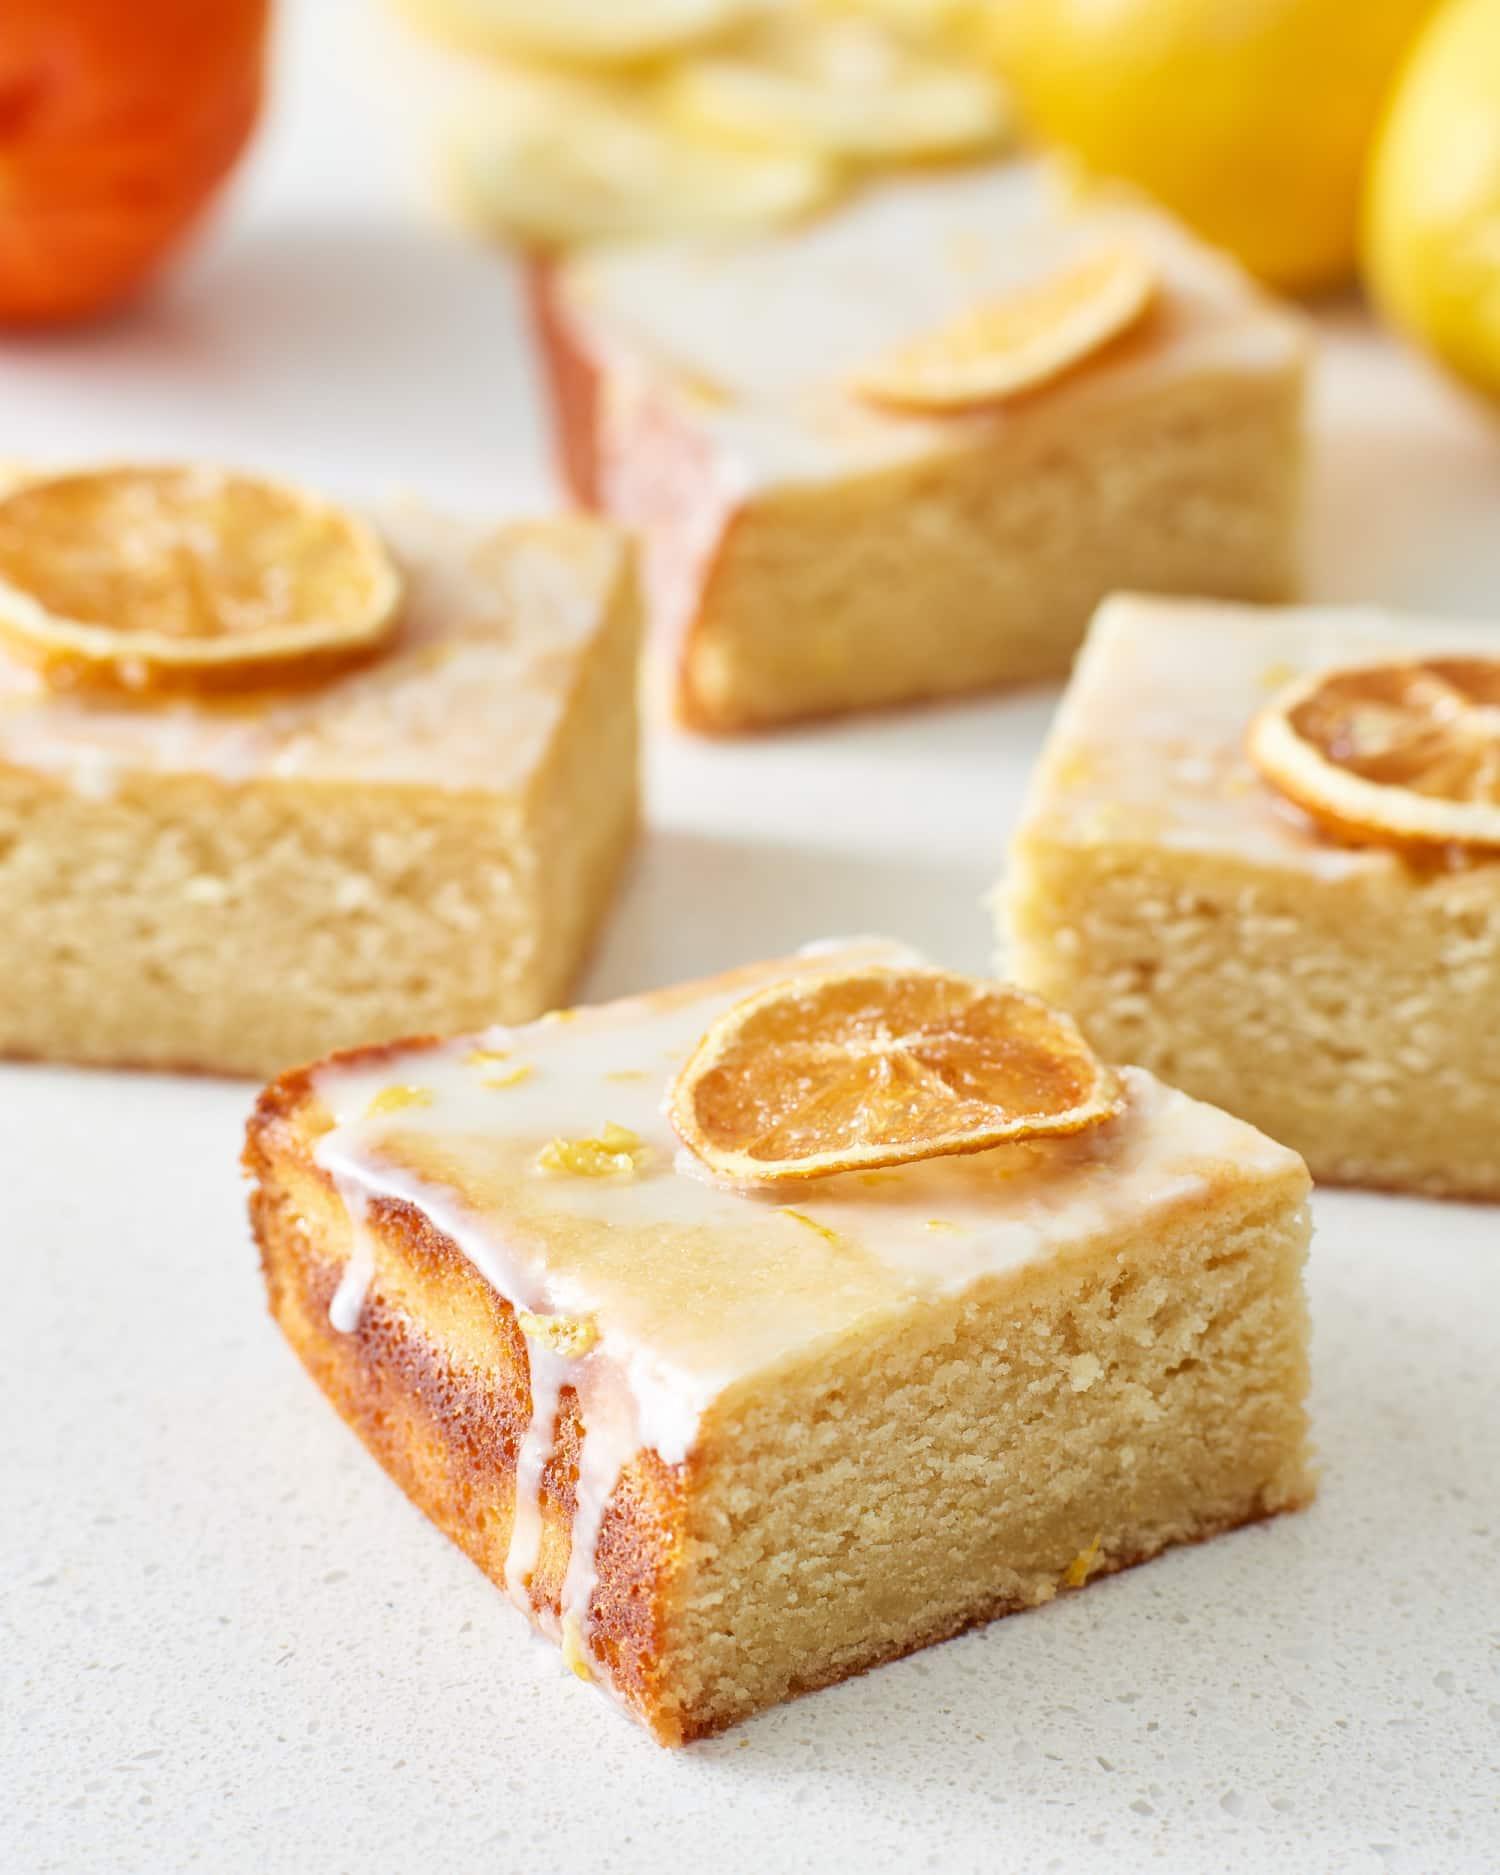 Recipe: Easy Lemon Drizzle Cake